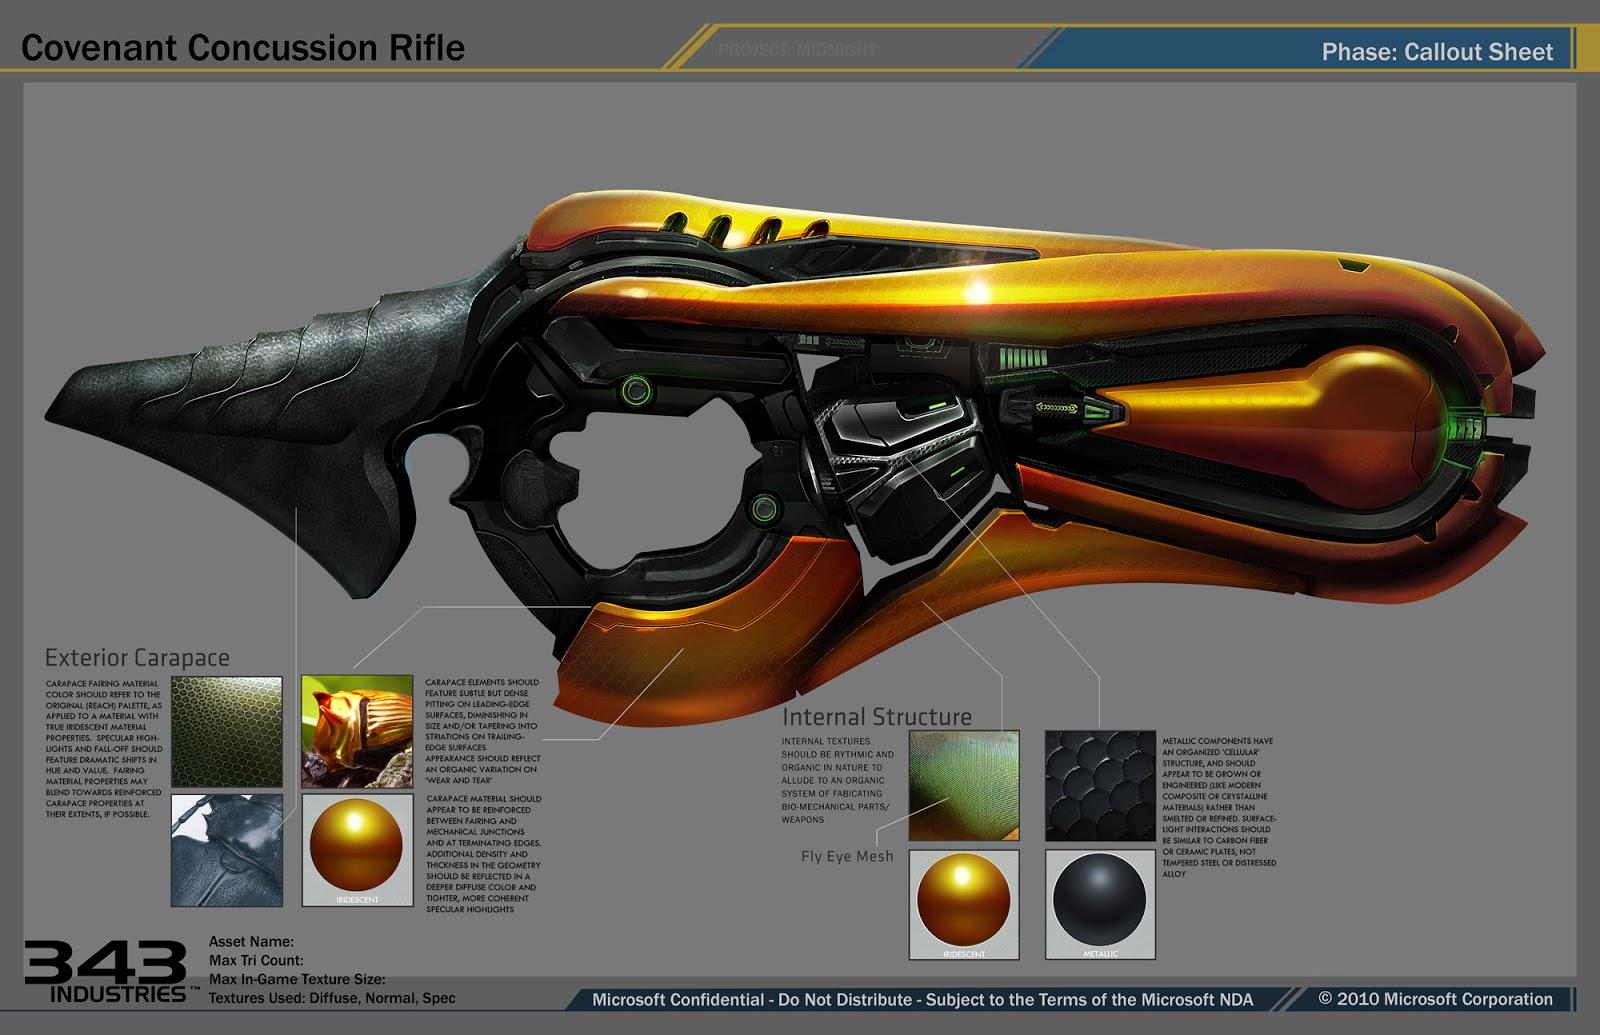 Halo 4 Weapons and Vehicles Designs.   HaloFanForLife